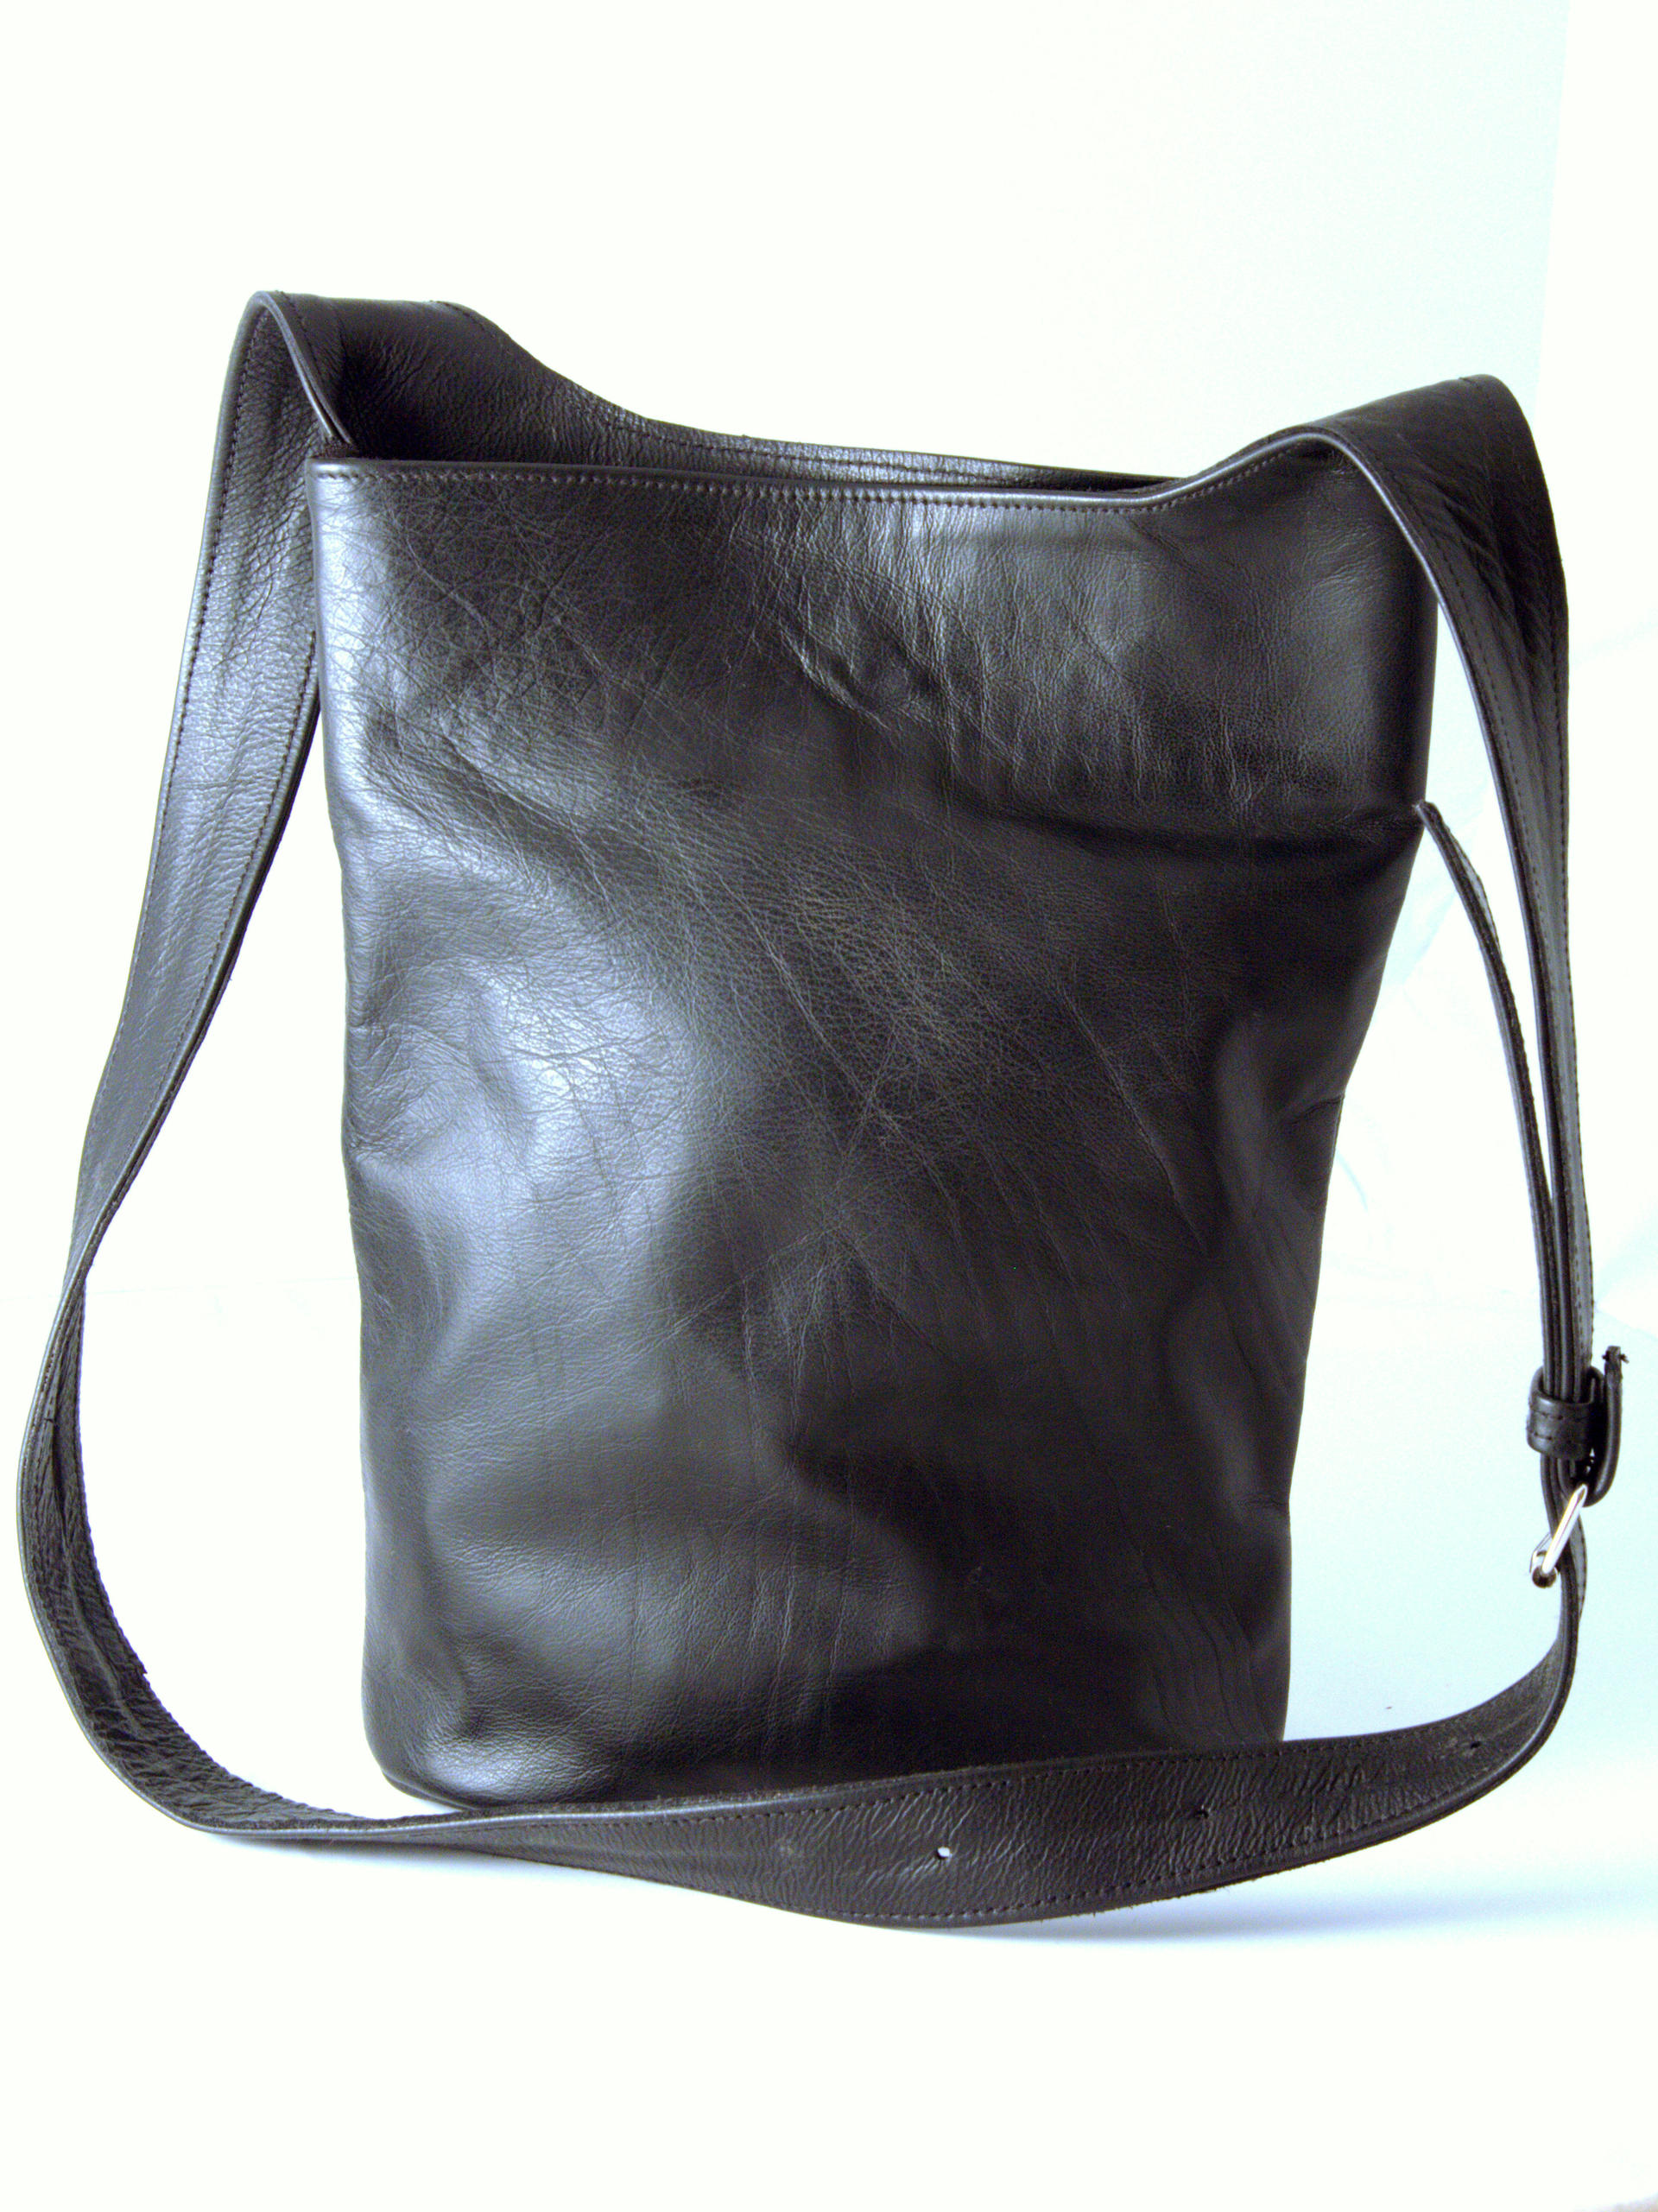 Gundara - Summer Time - genuine leather - fair trade bag from Afghanistan - black